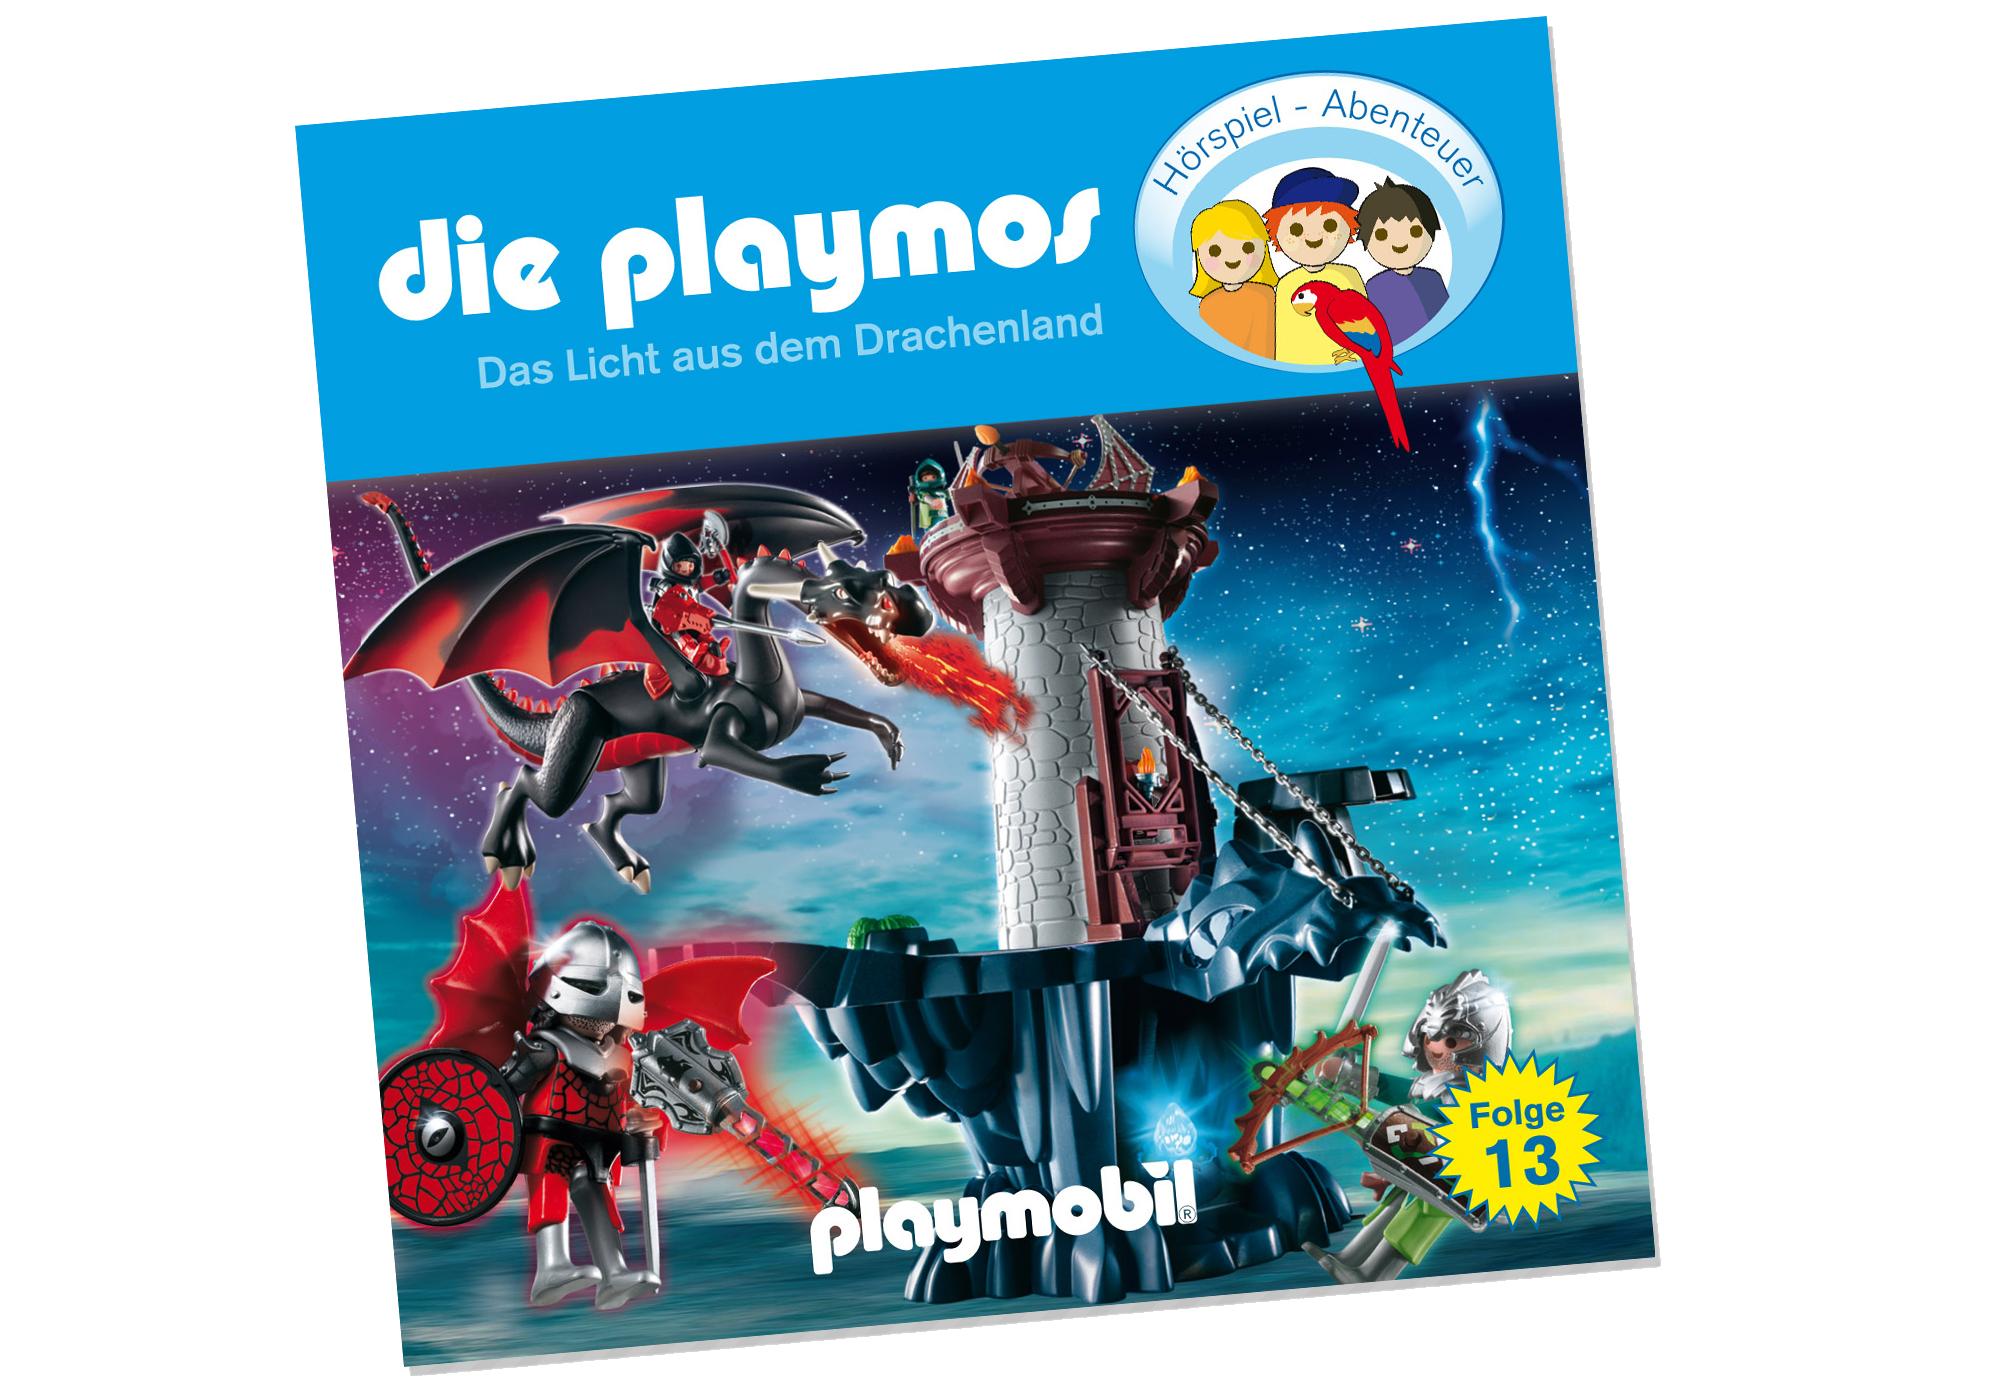 http://media.playmobil.com/i/playmobil/80243_product_detail